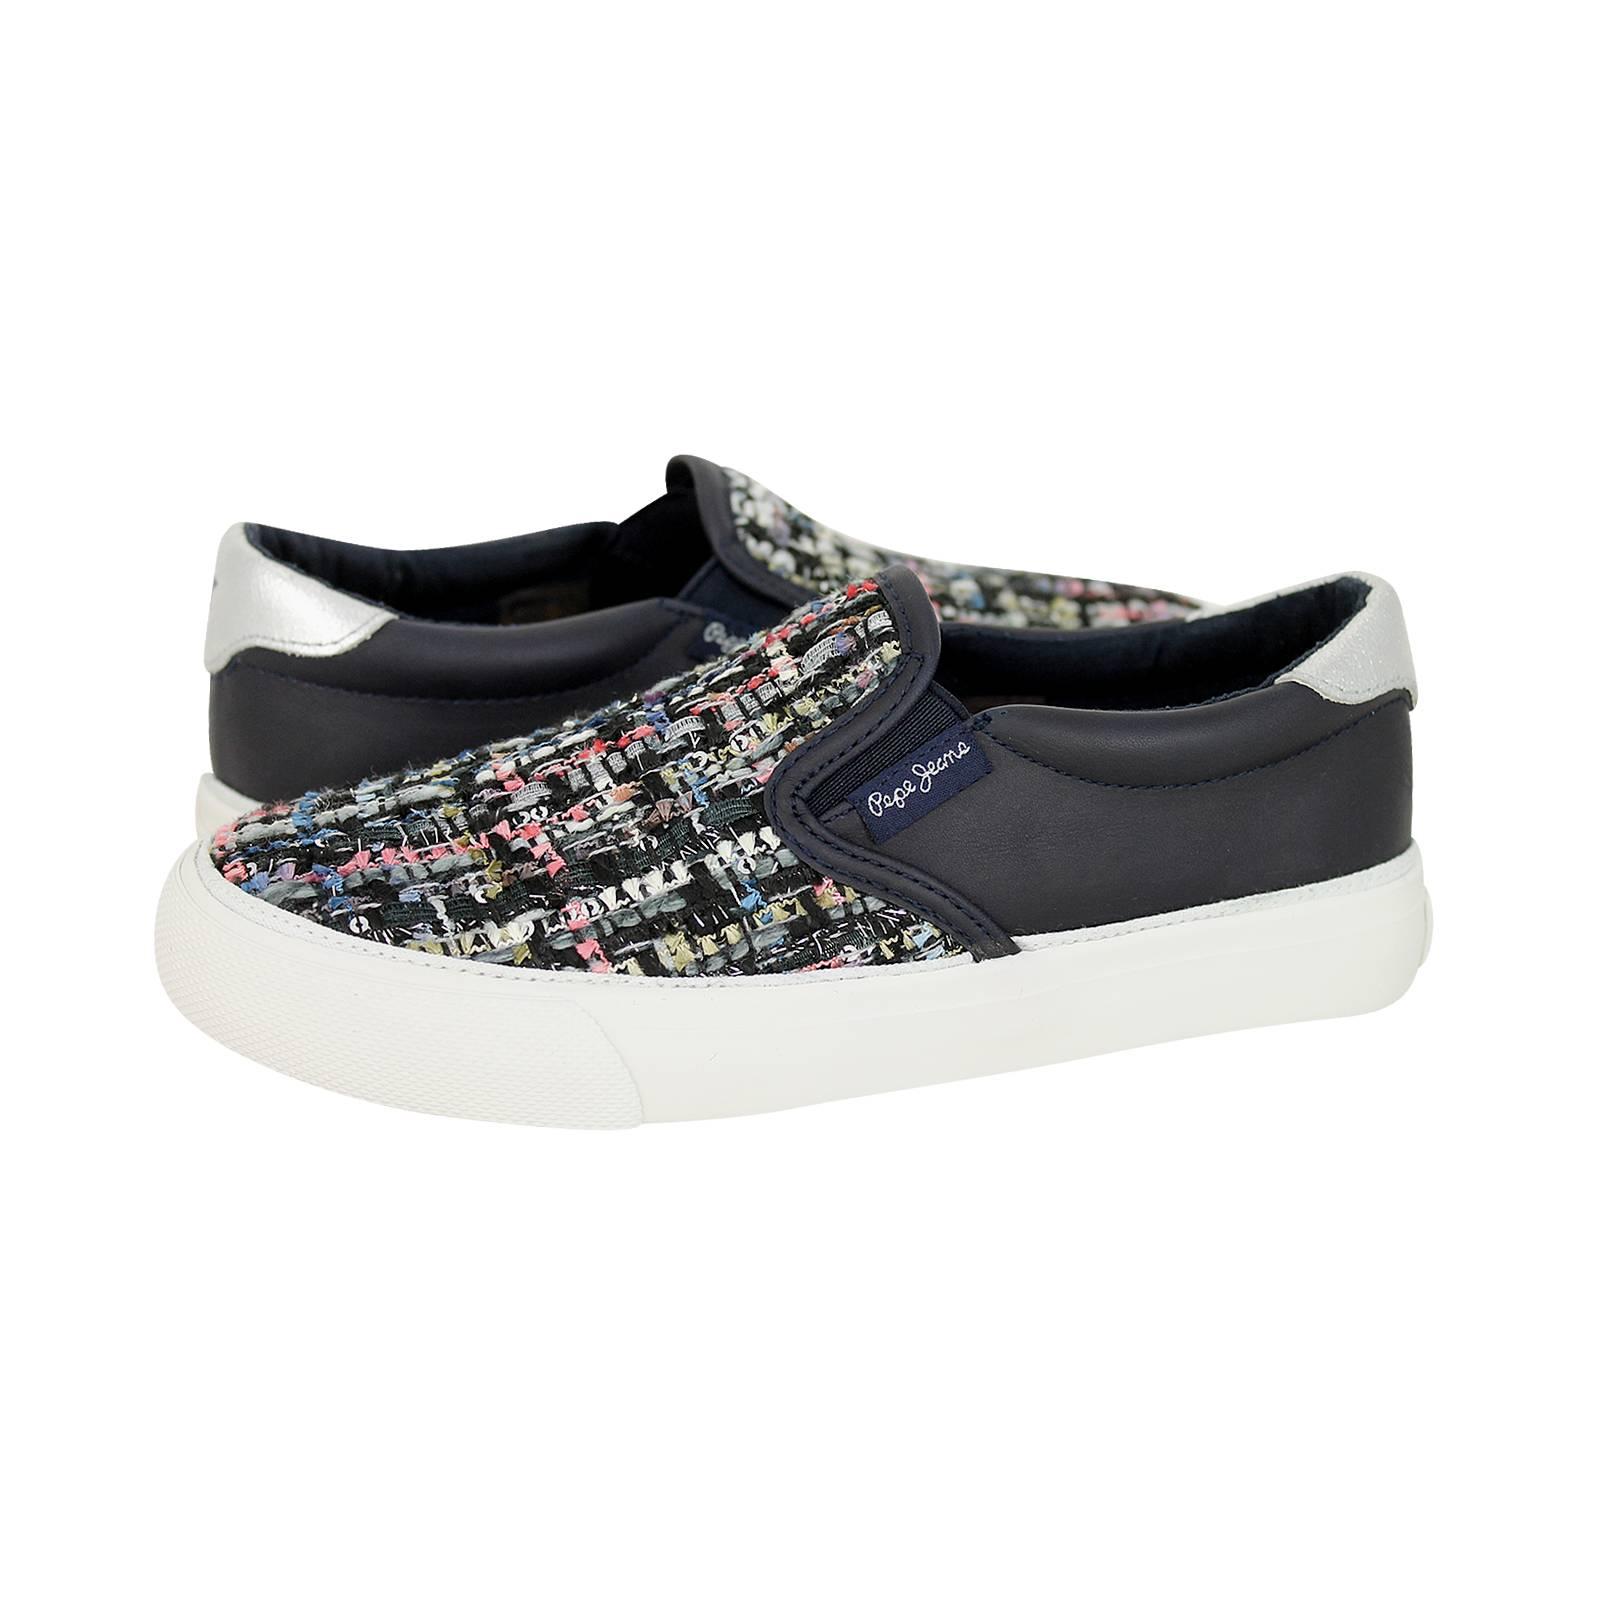 0d75f881e3d Castillon - Παιδικά παπούτσια casual Pepe Jeans από υφασμα και δερμα ...